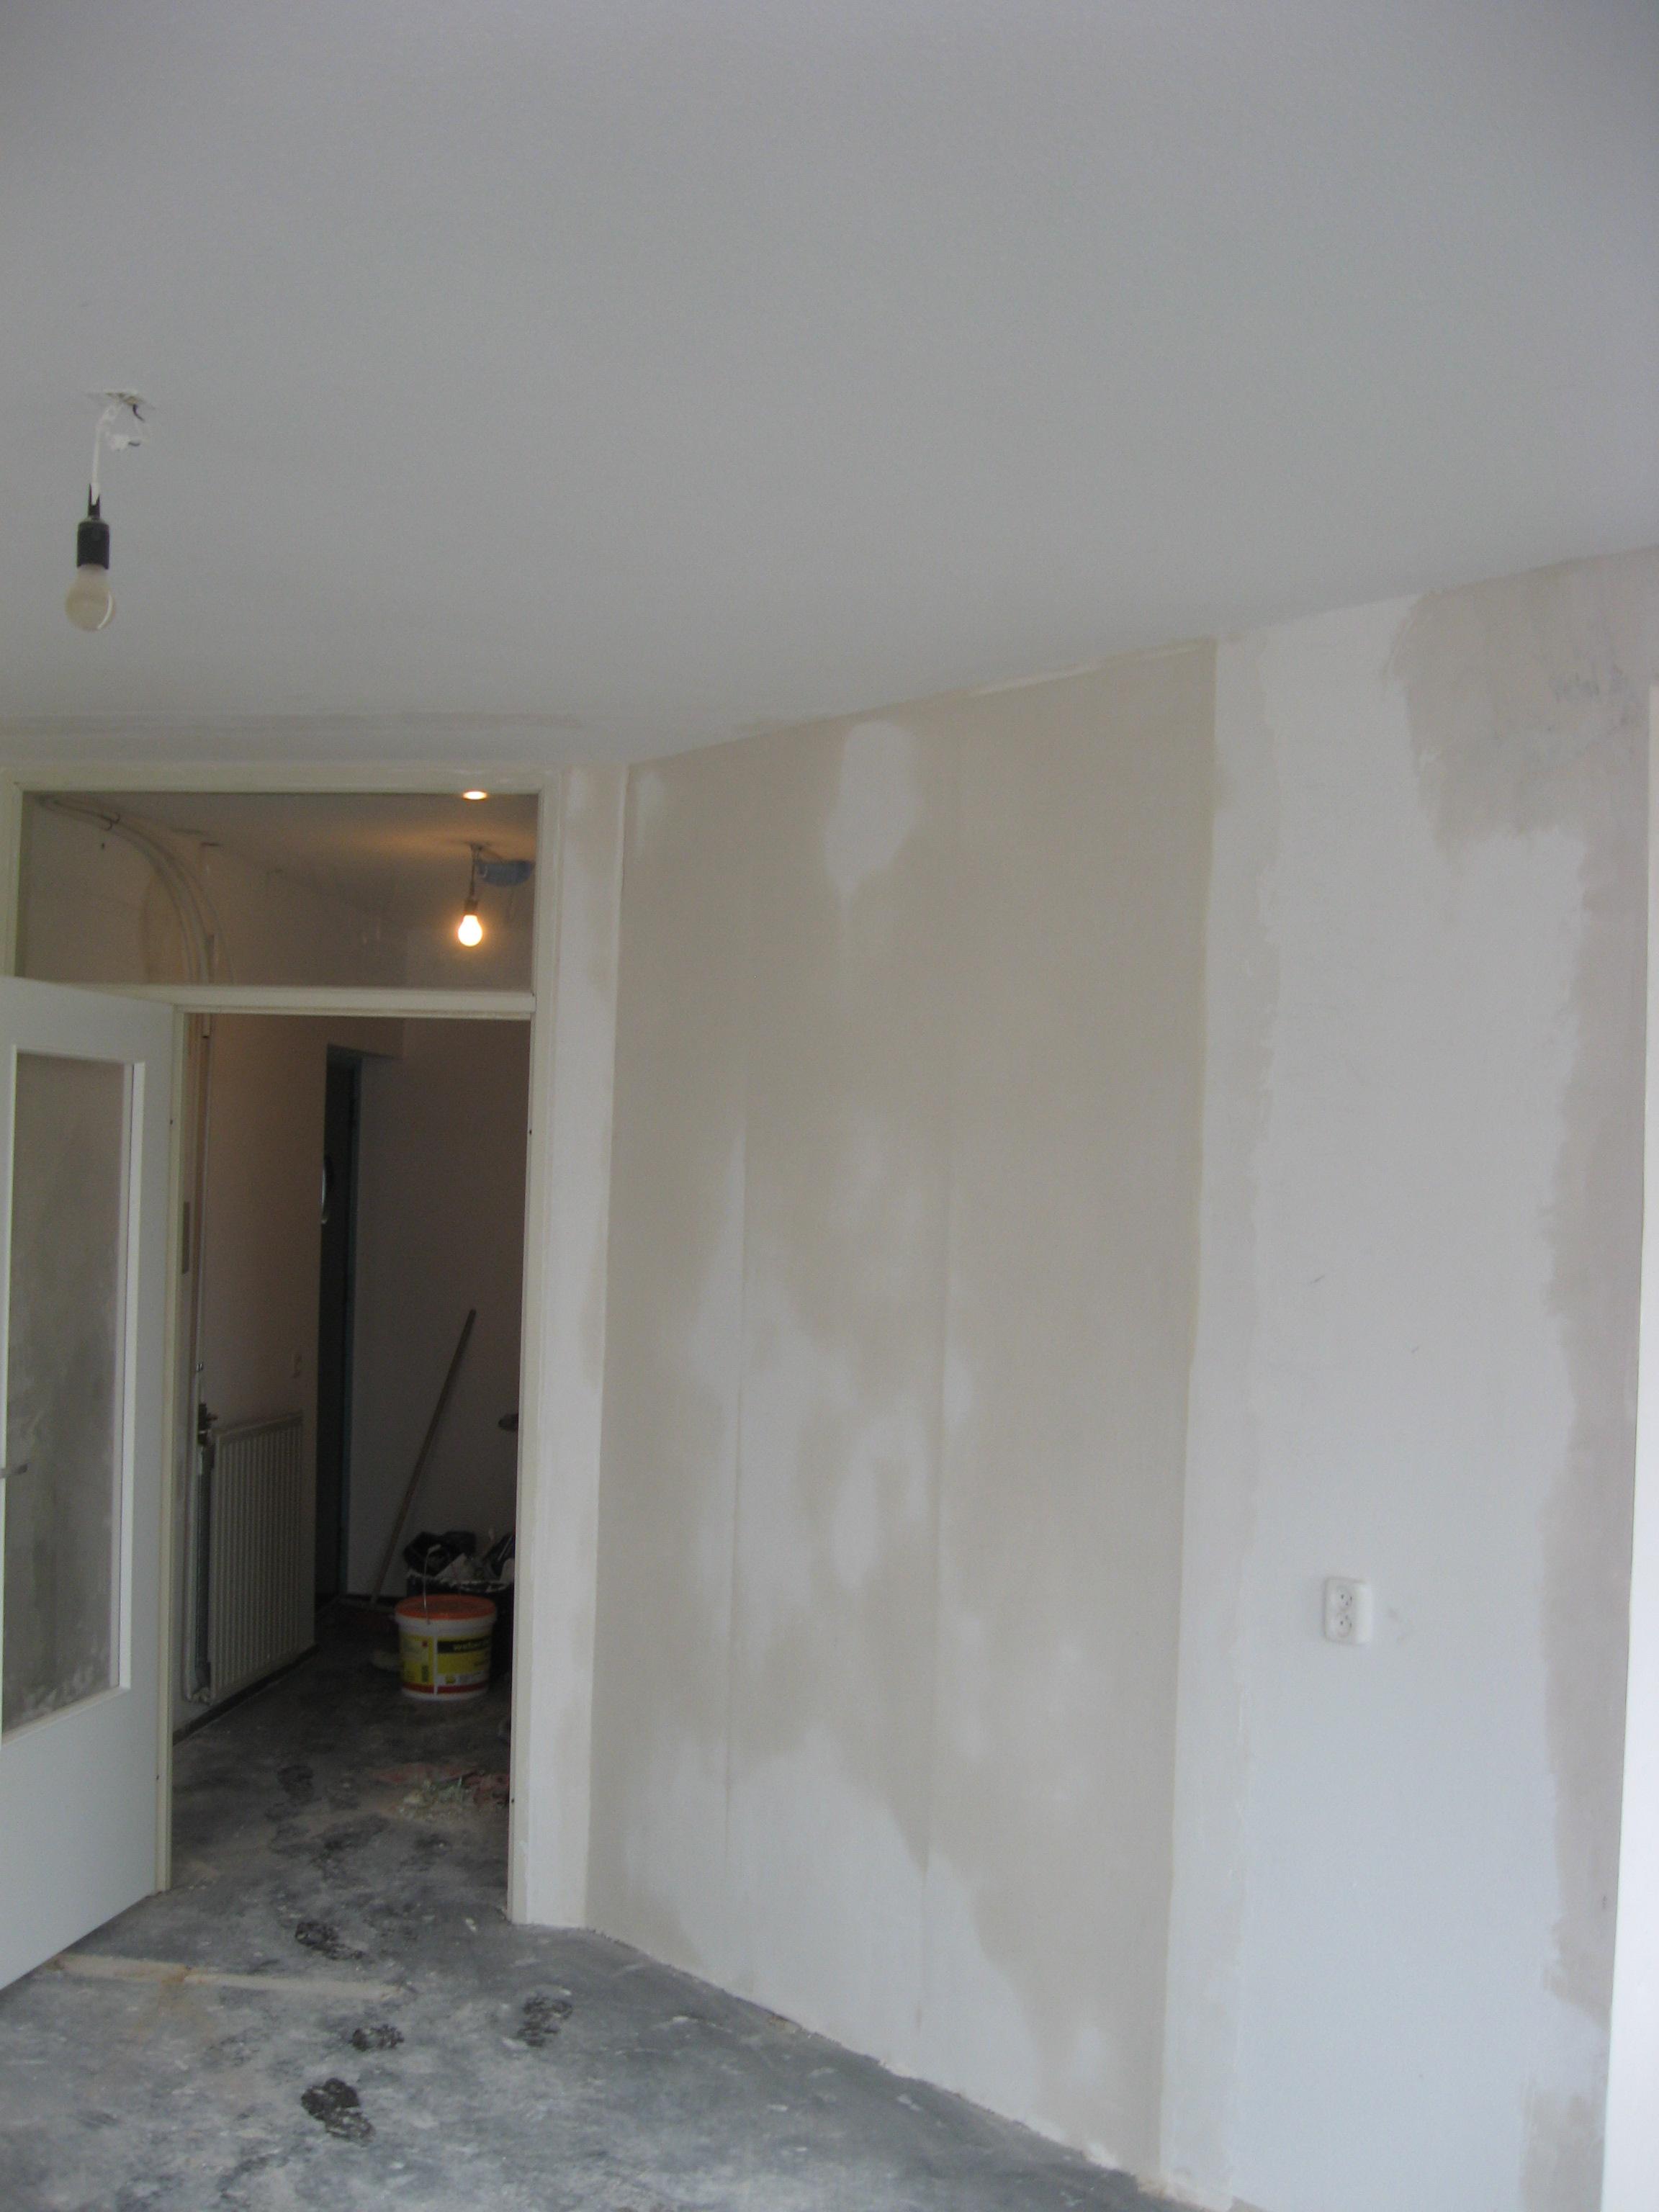 Keuken Renovatie Amsterdam : amsterdam- aannemer amsterdam-renovatie aannemer amsterdam